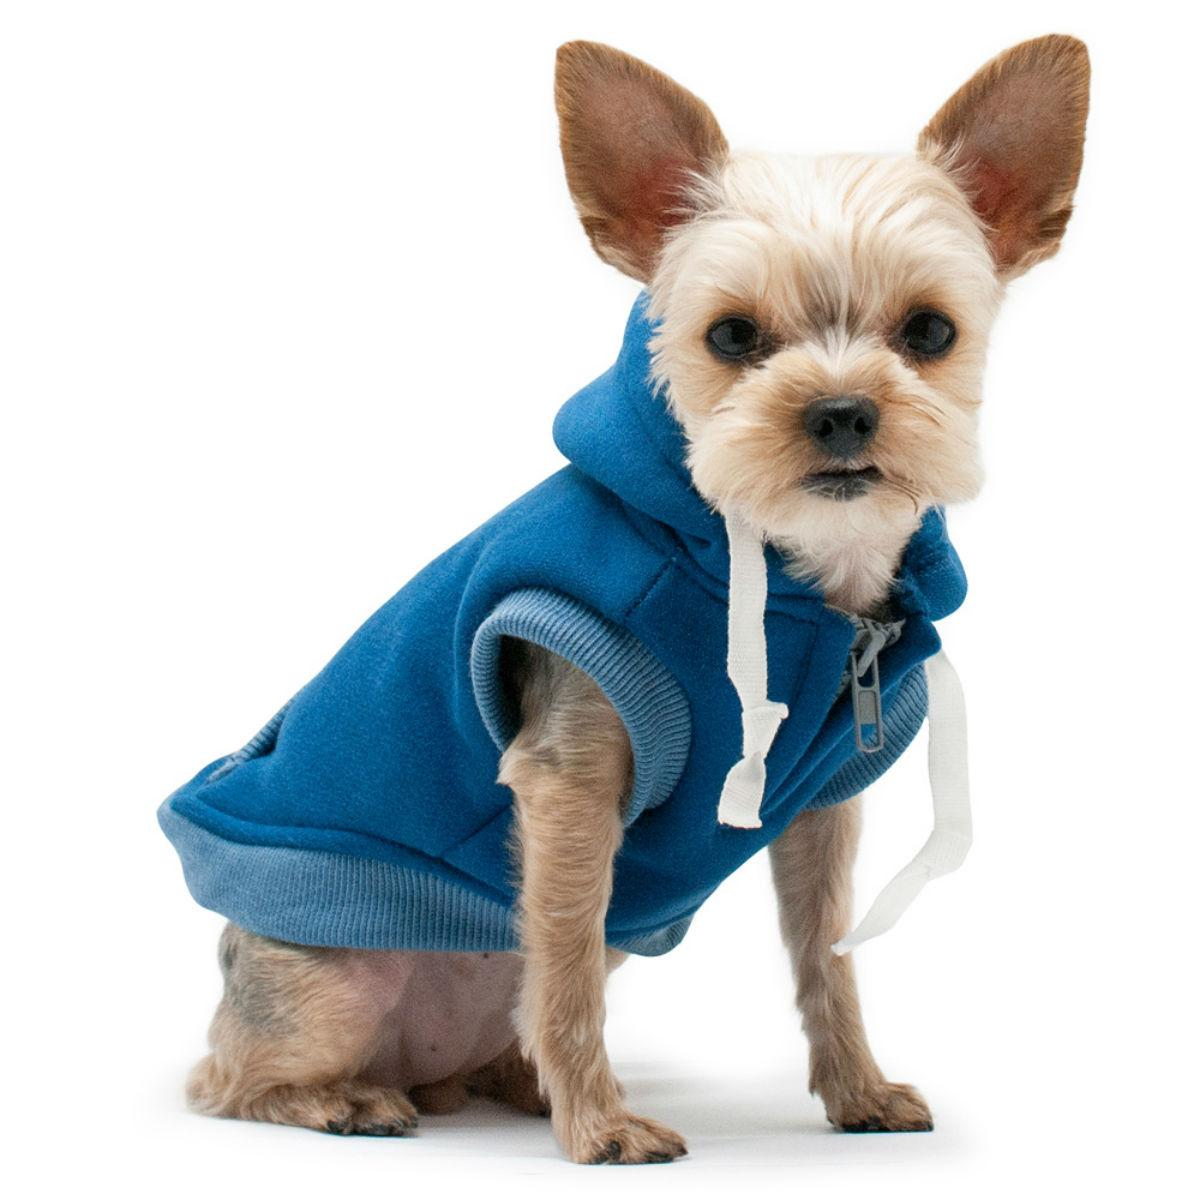 Drawstring Dog Hoodie by Dogo - Blue